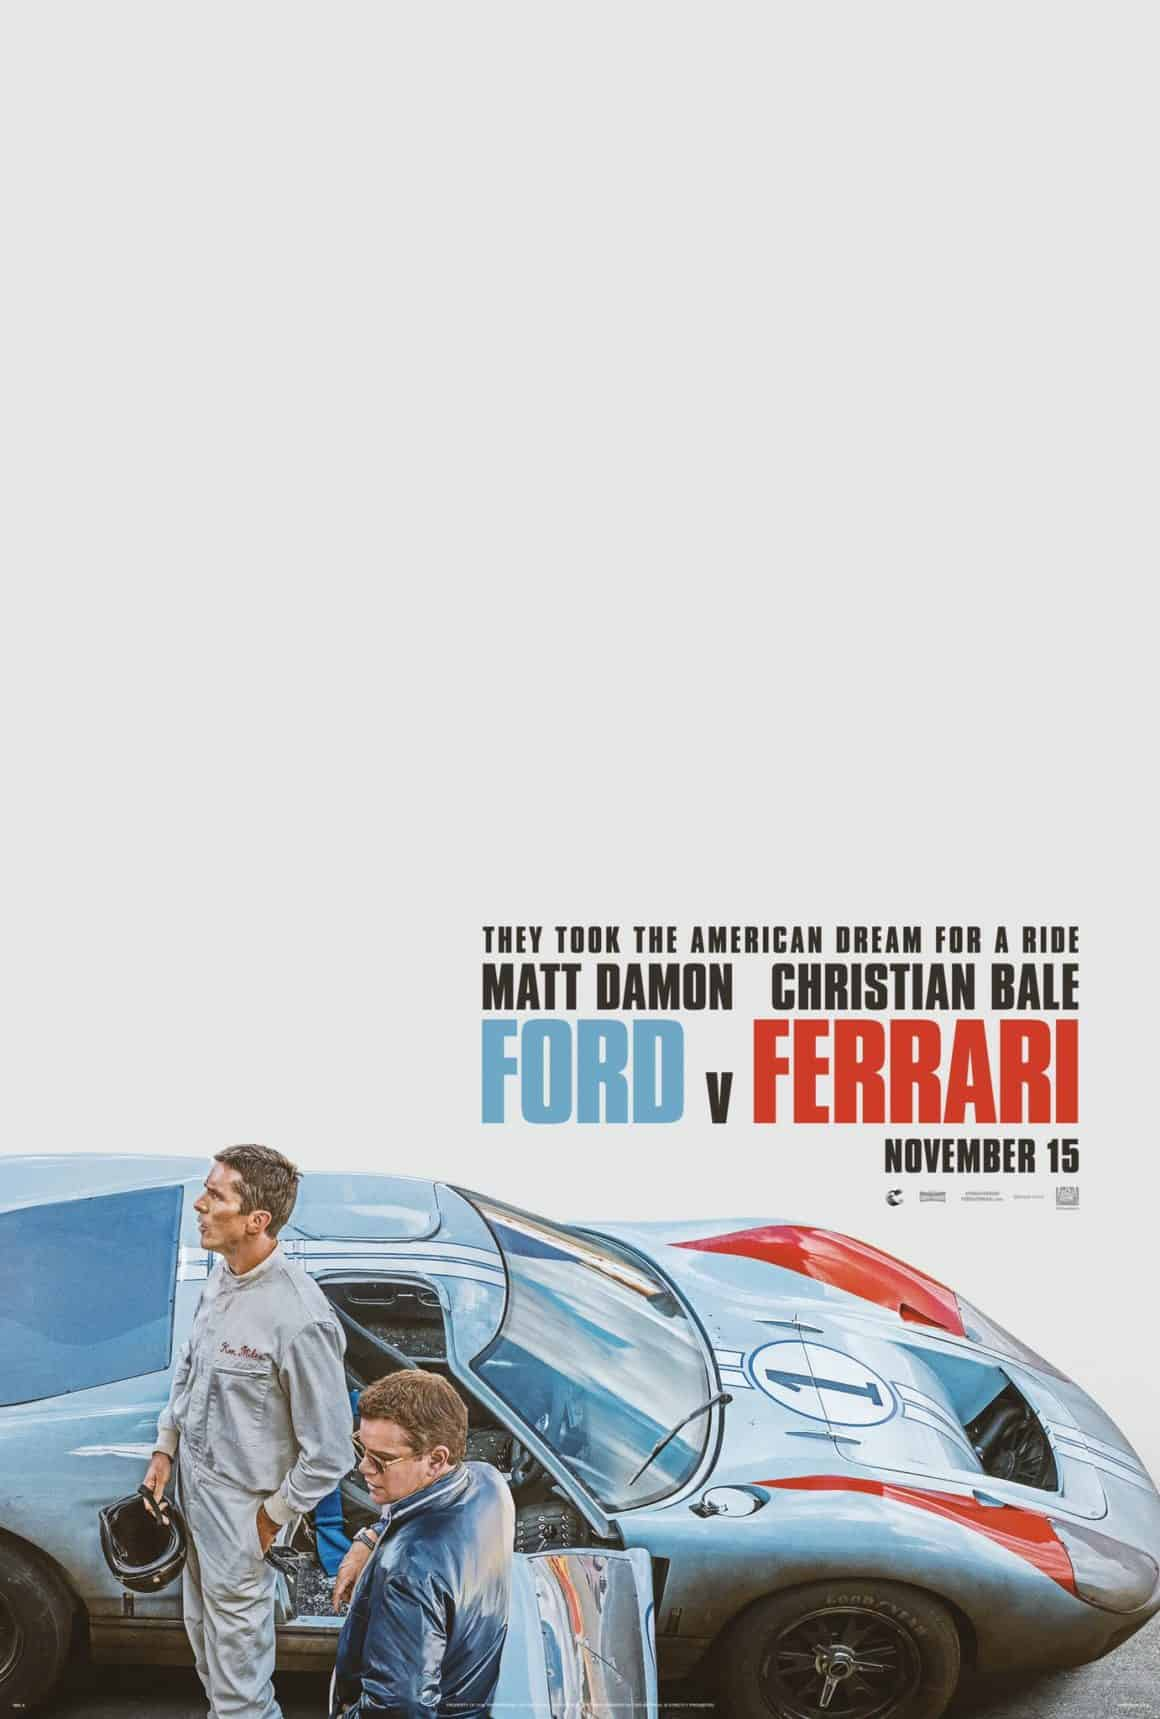 wentieth Century Fox's FORD V. FERRARI